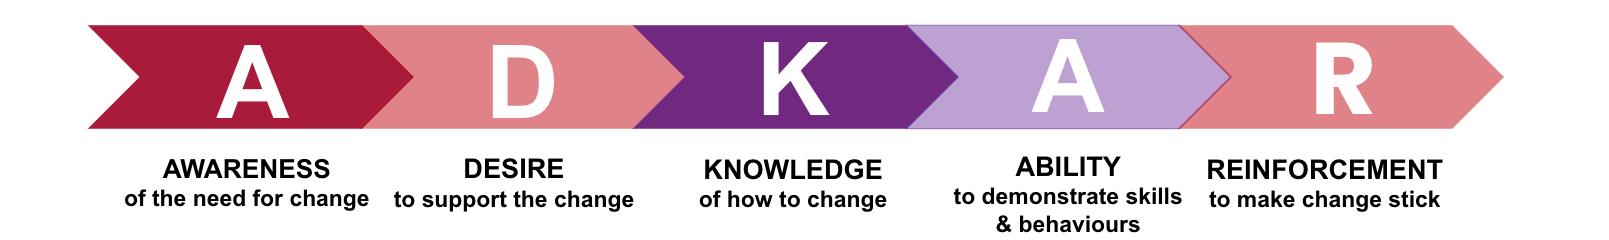 The ADKAR change management model